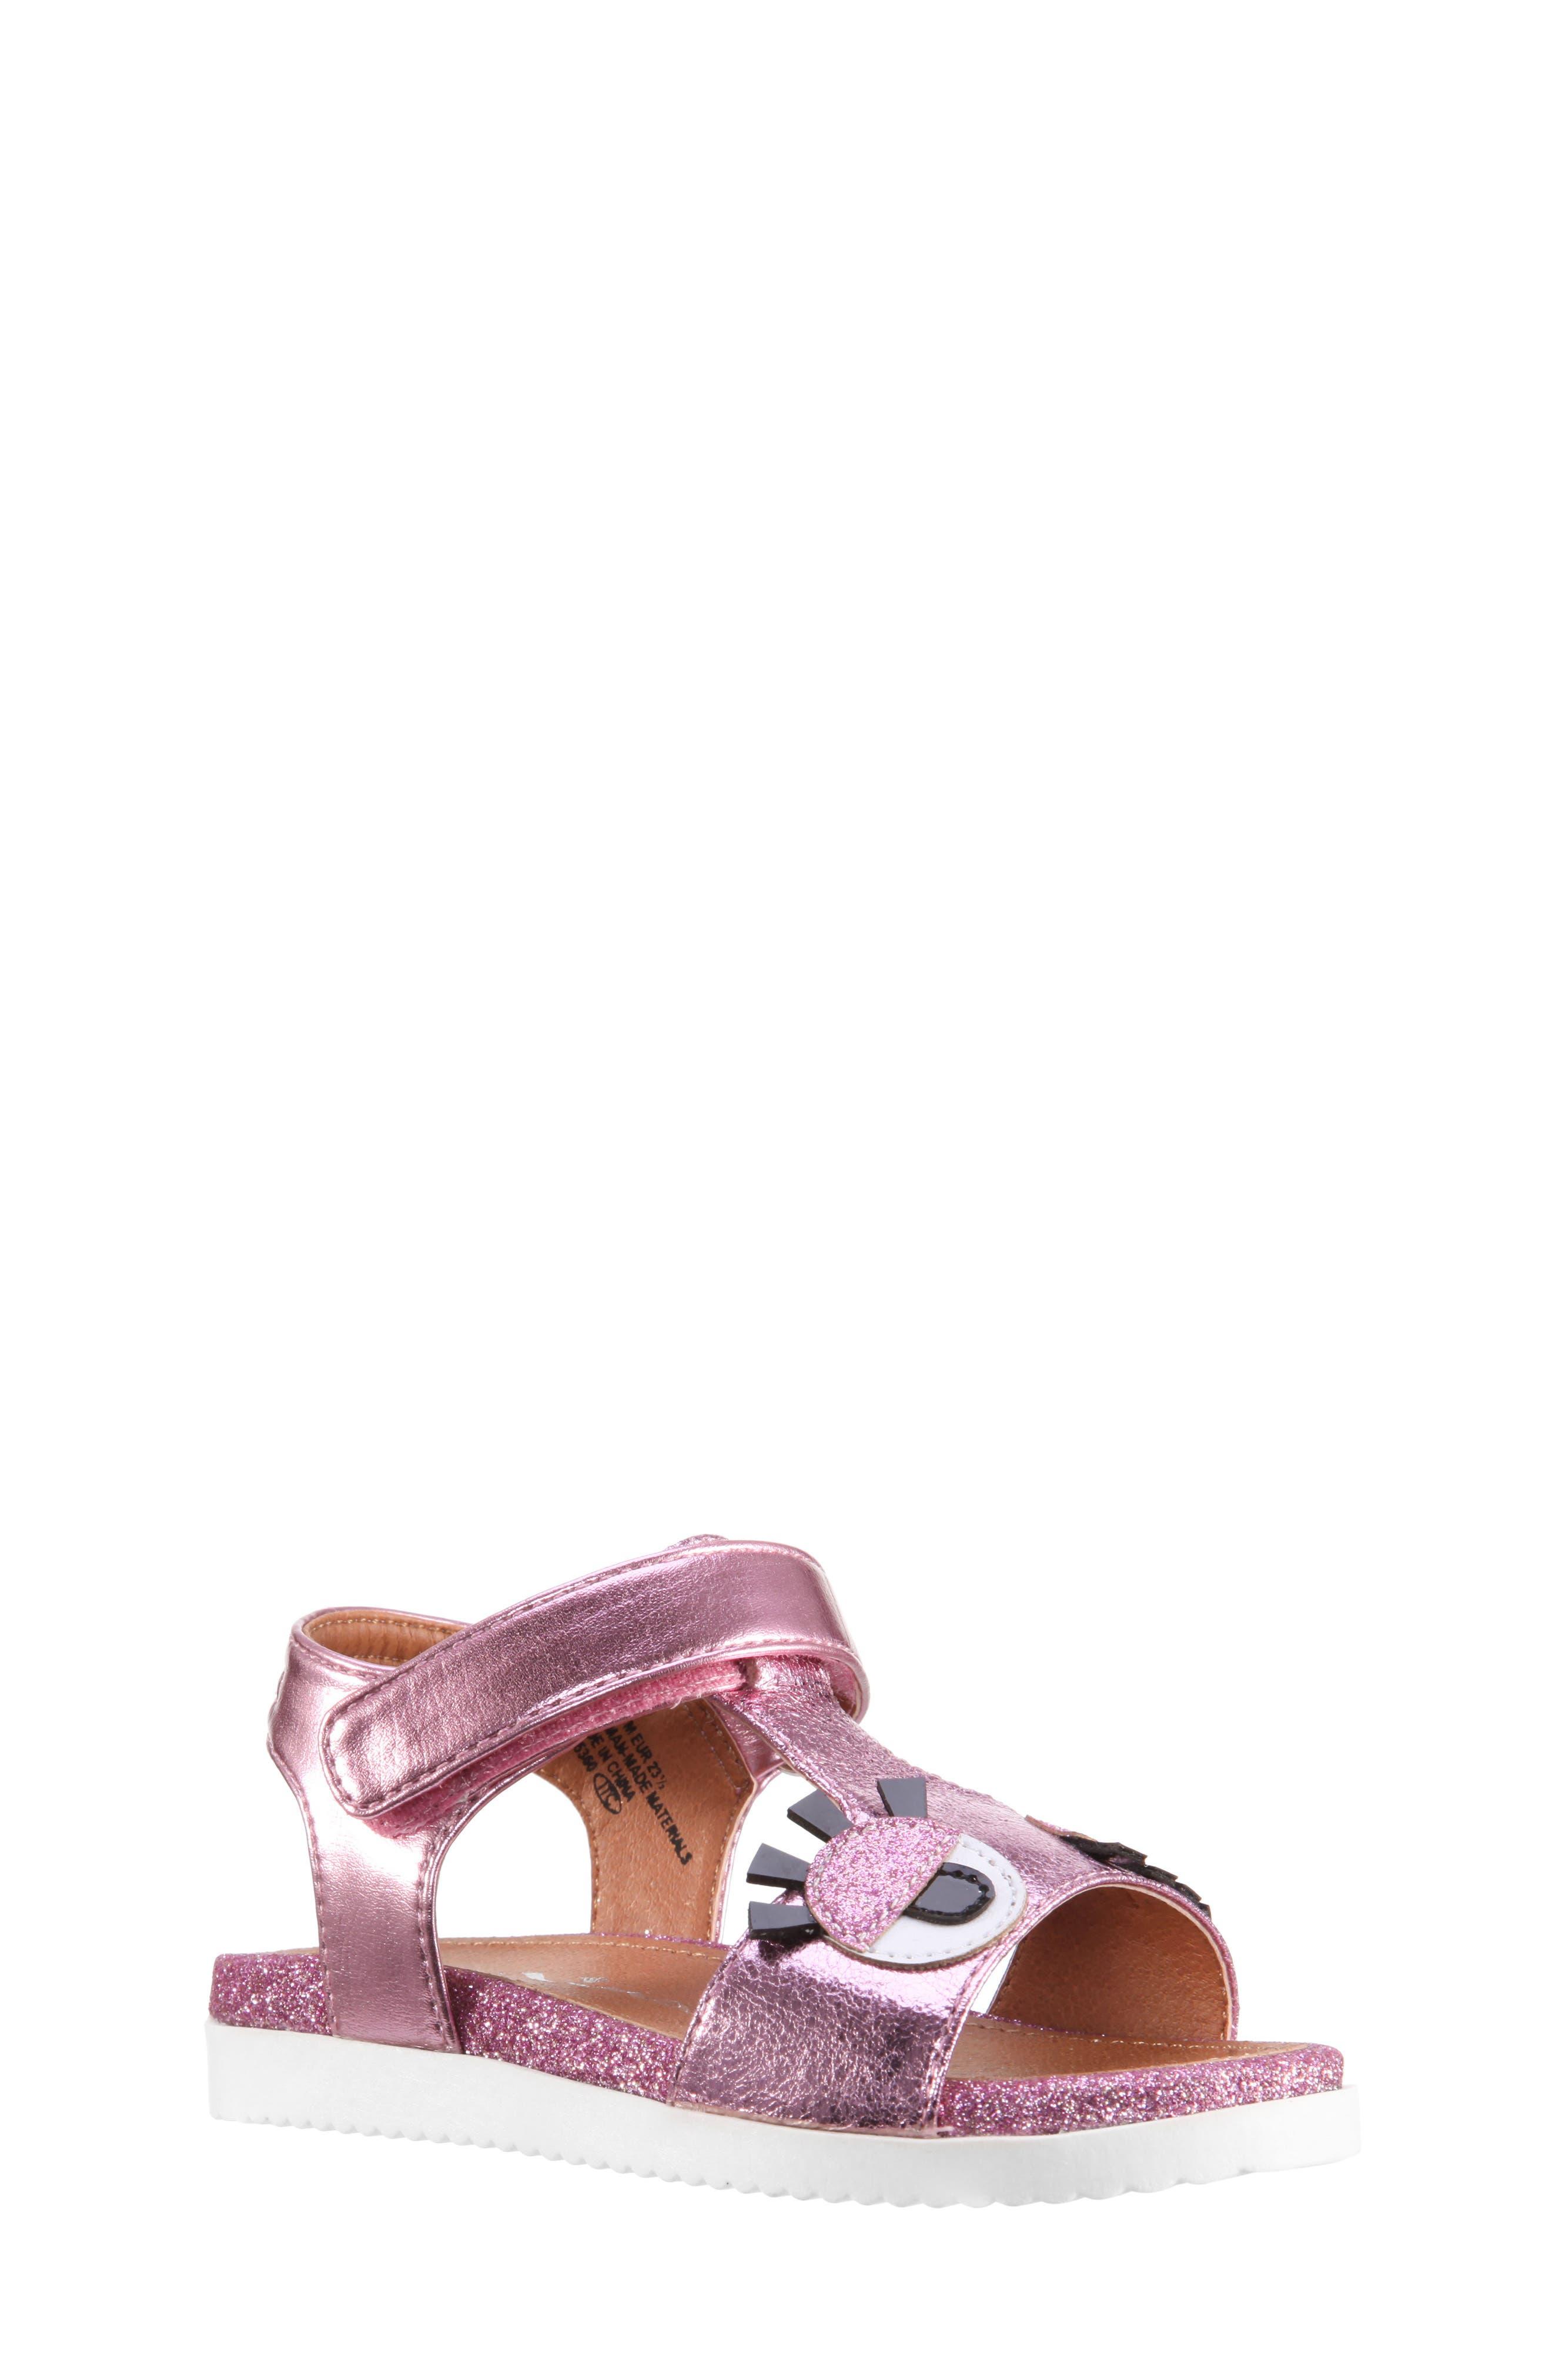 Luciella Wink Sandal,                         Main,                         color, 695